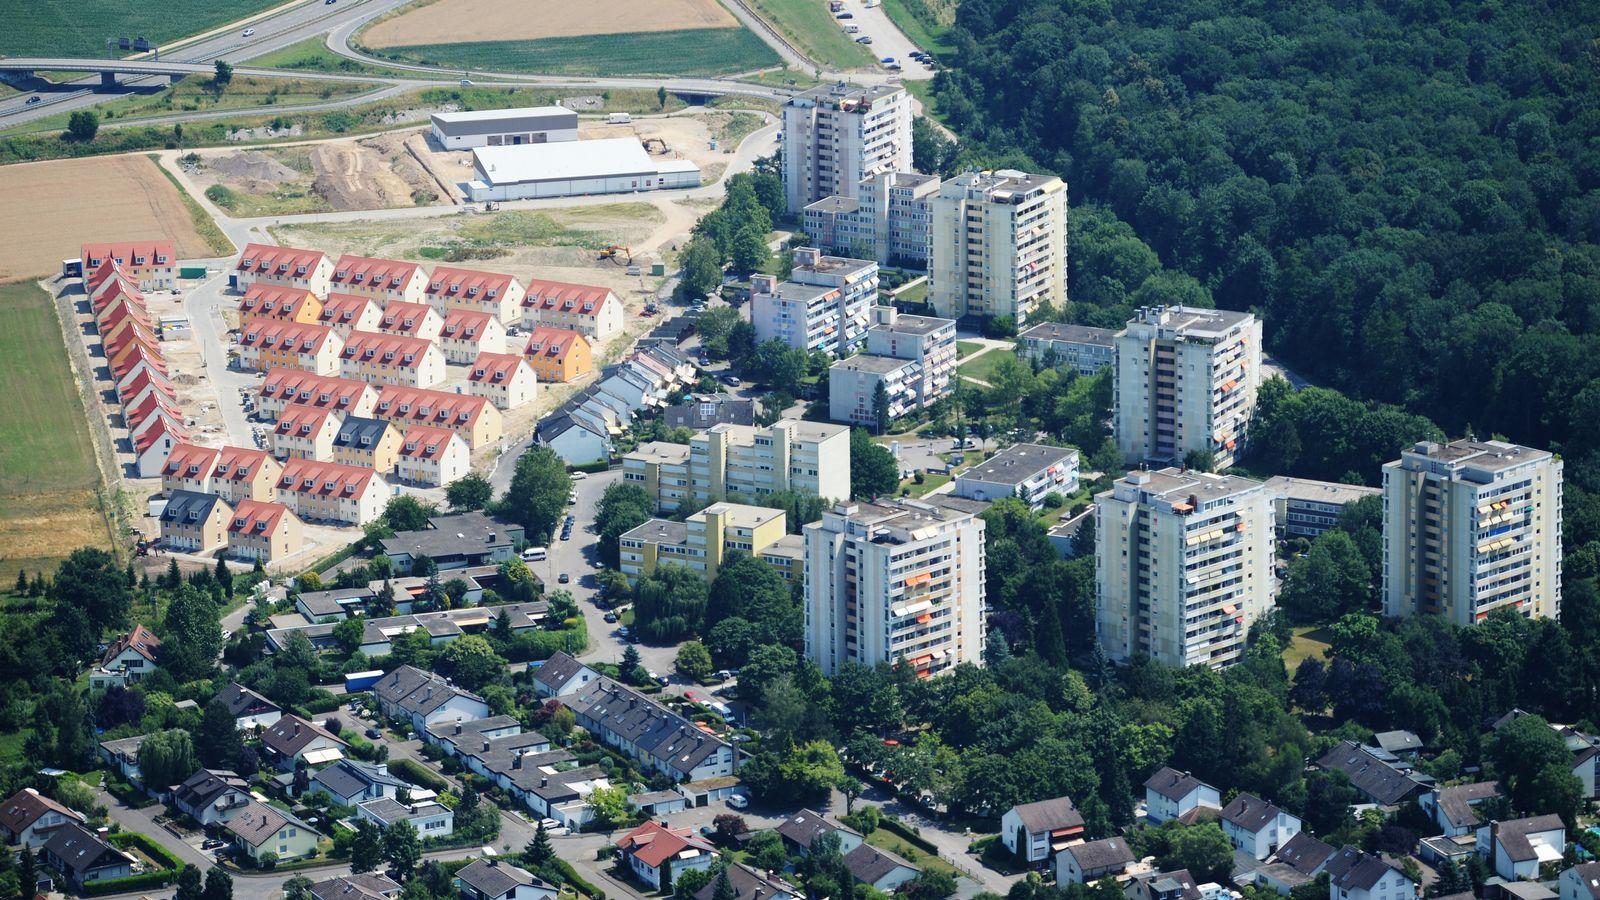 Immobilien / Immobilienmarkt / Wohnbaugebiet in Umkirch